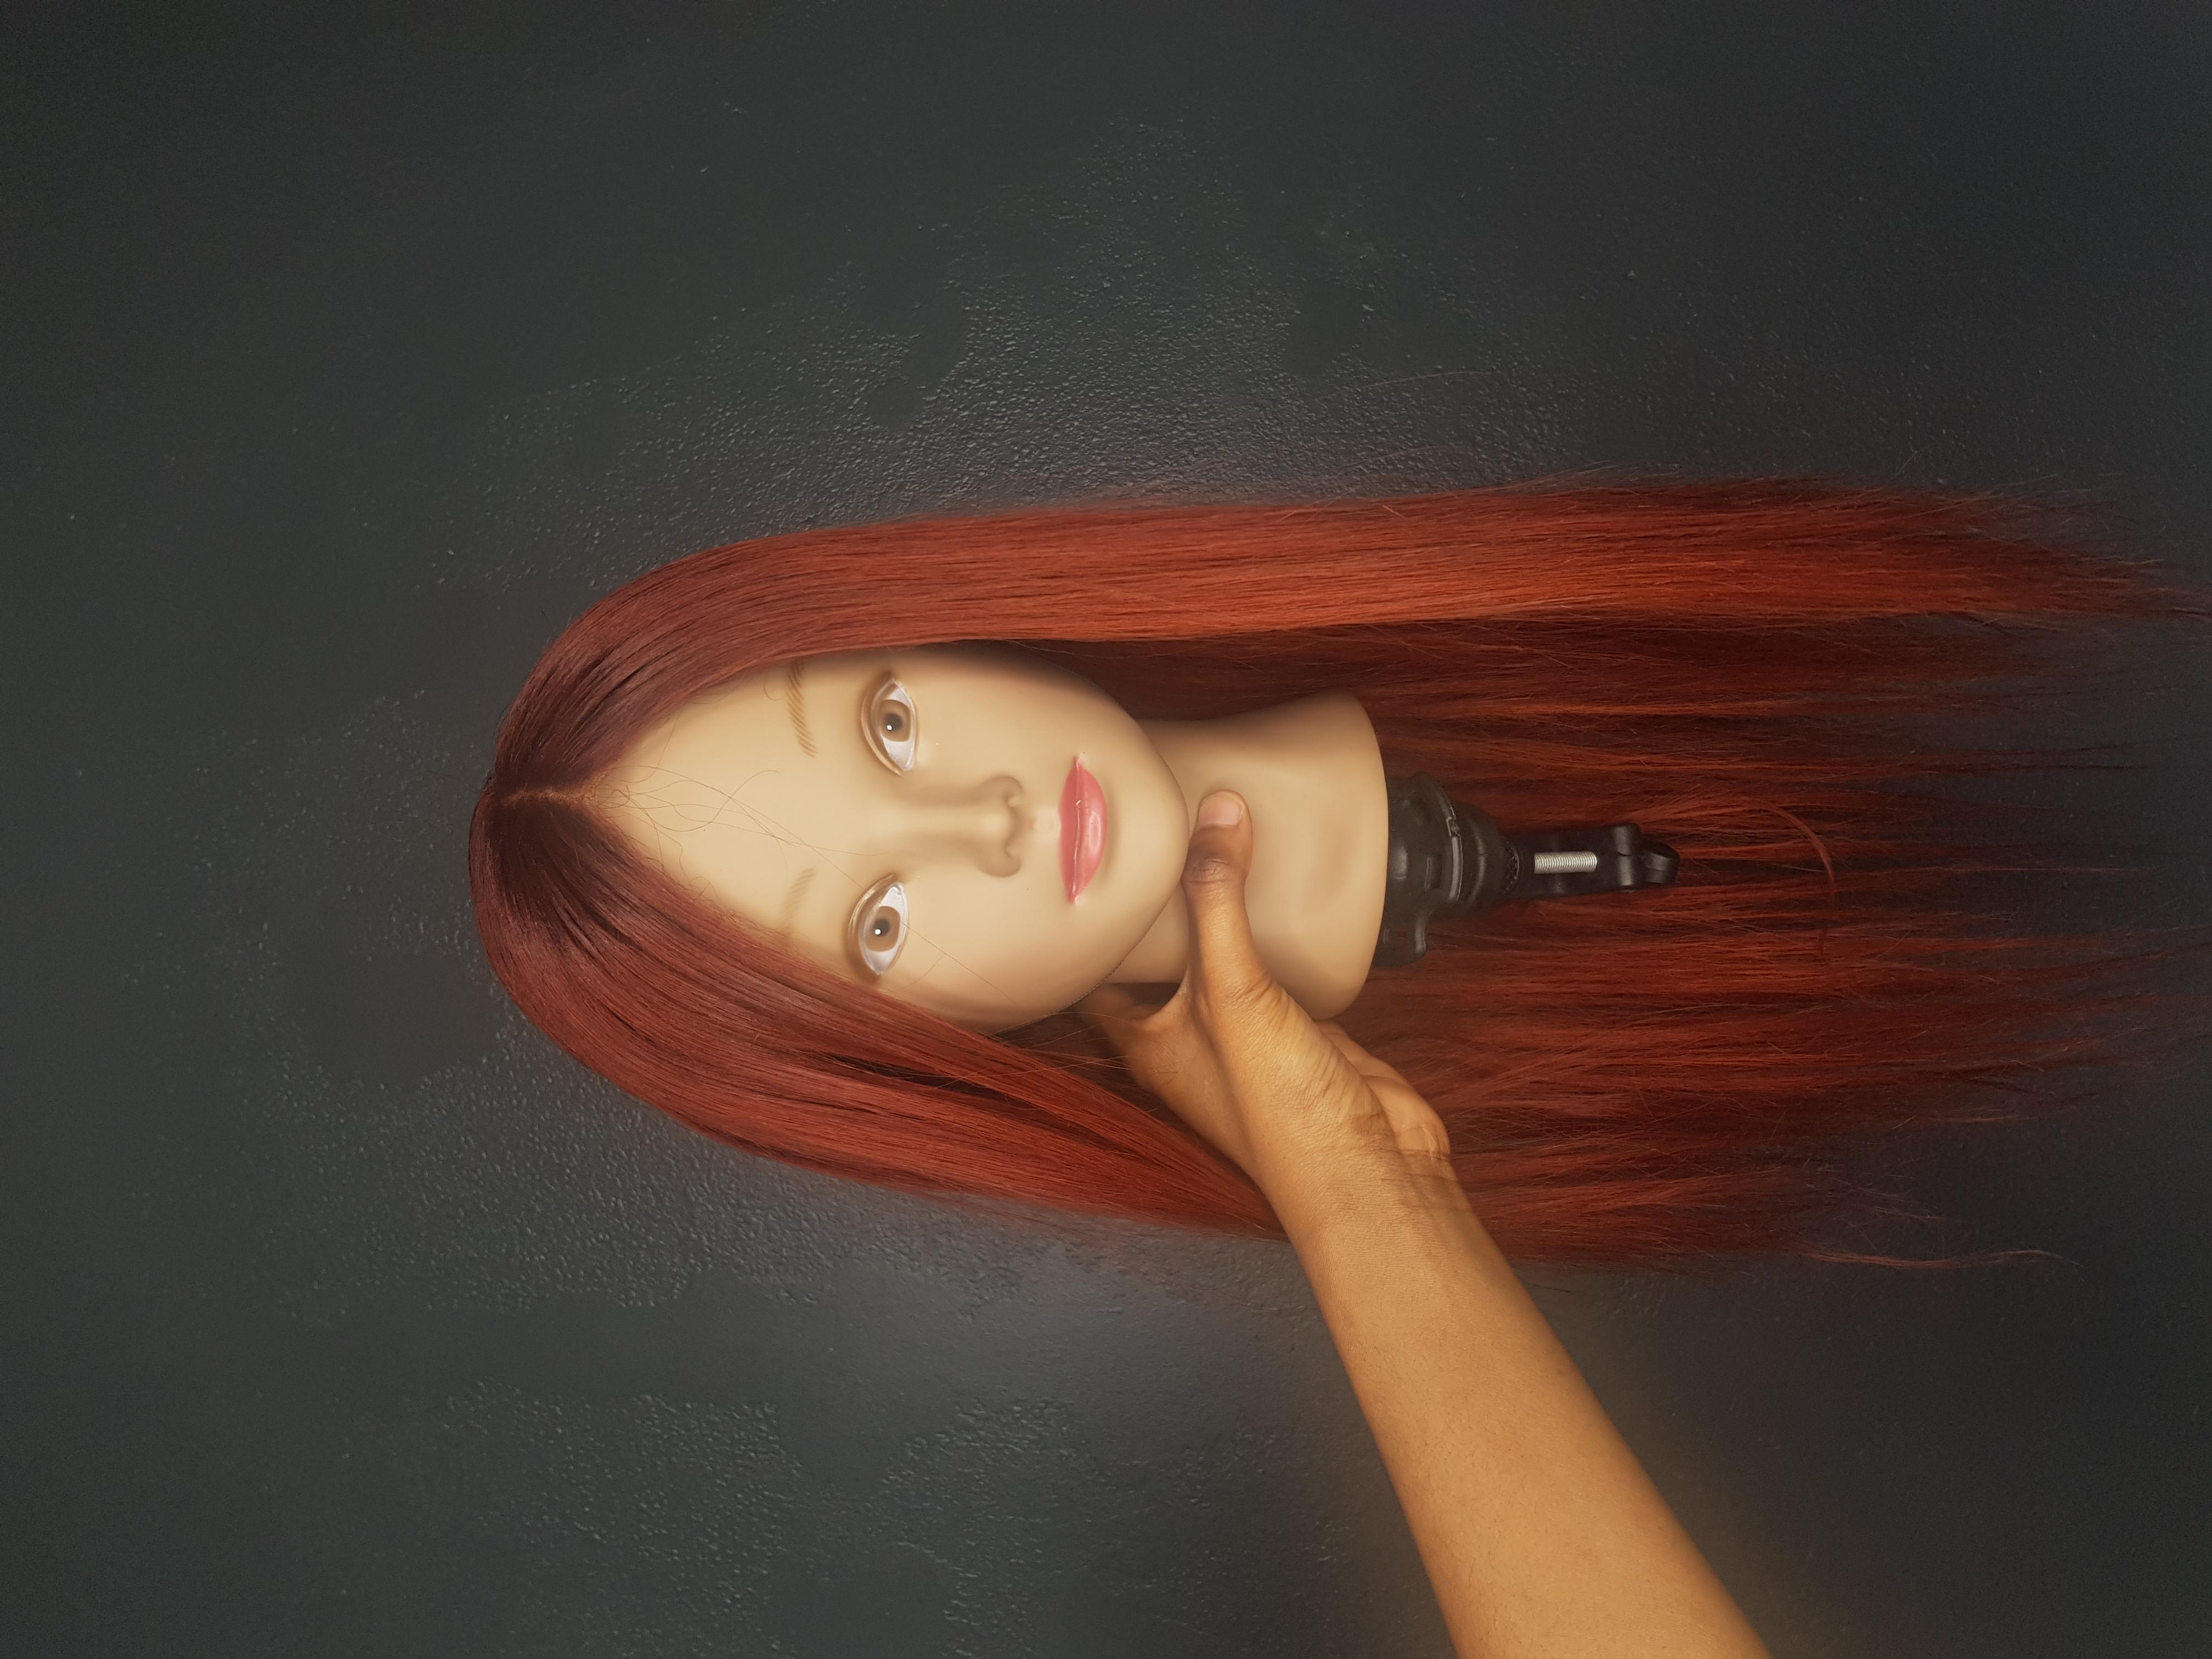 salon de coiffure afro tresse tresses box braids crochet braids vanilles tissages paris 75 77 78 91 92 93 94 95 MGTHWEID